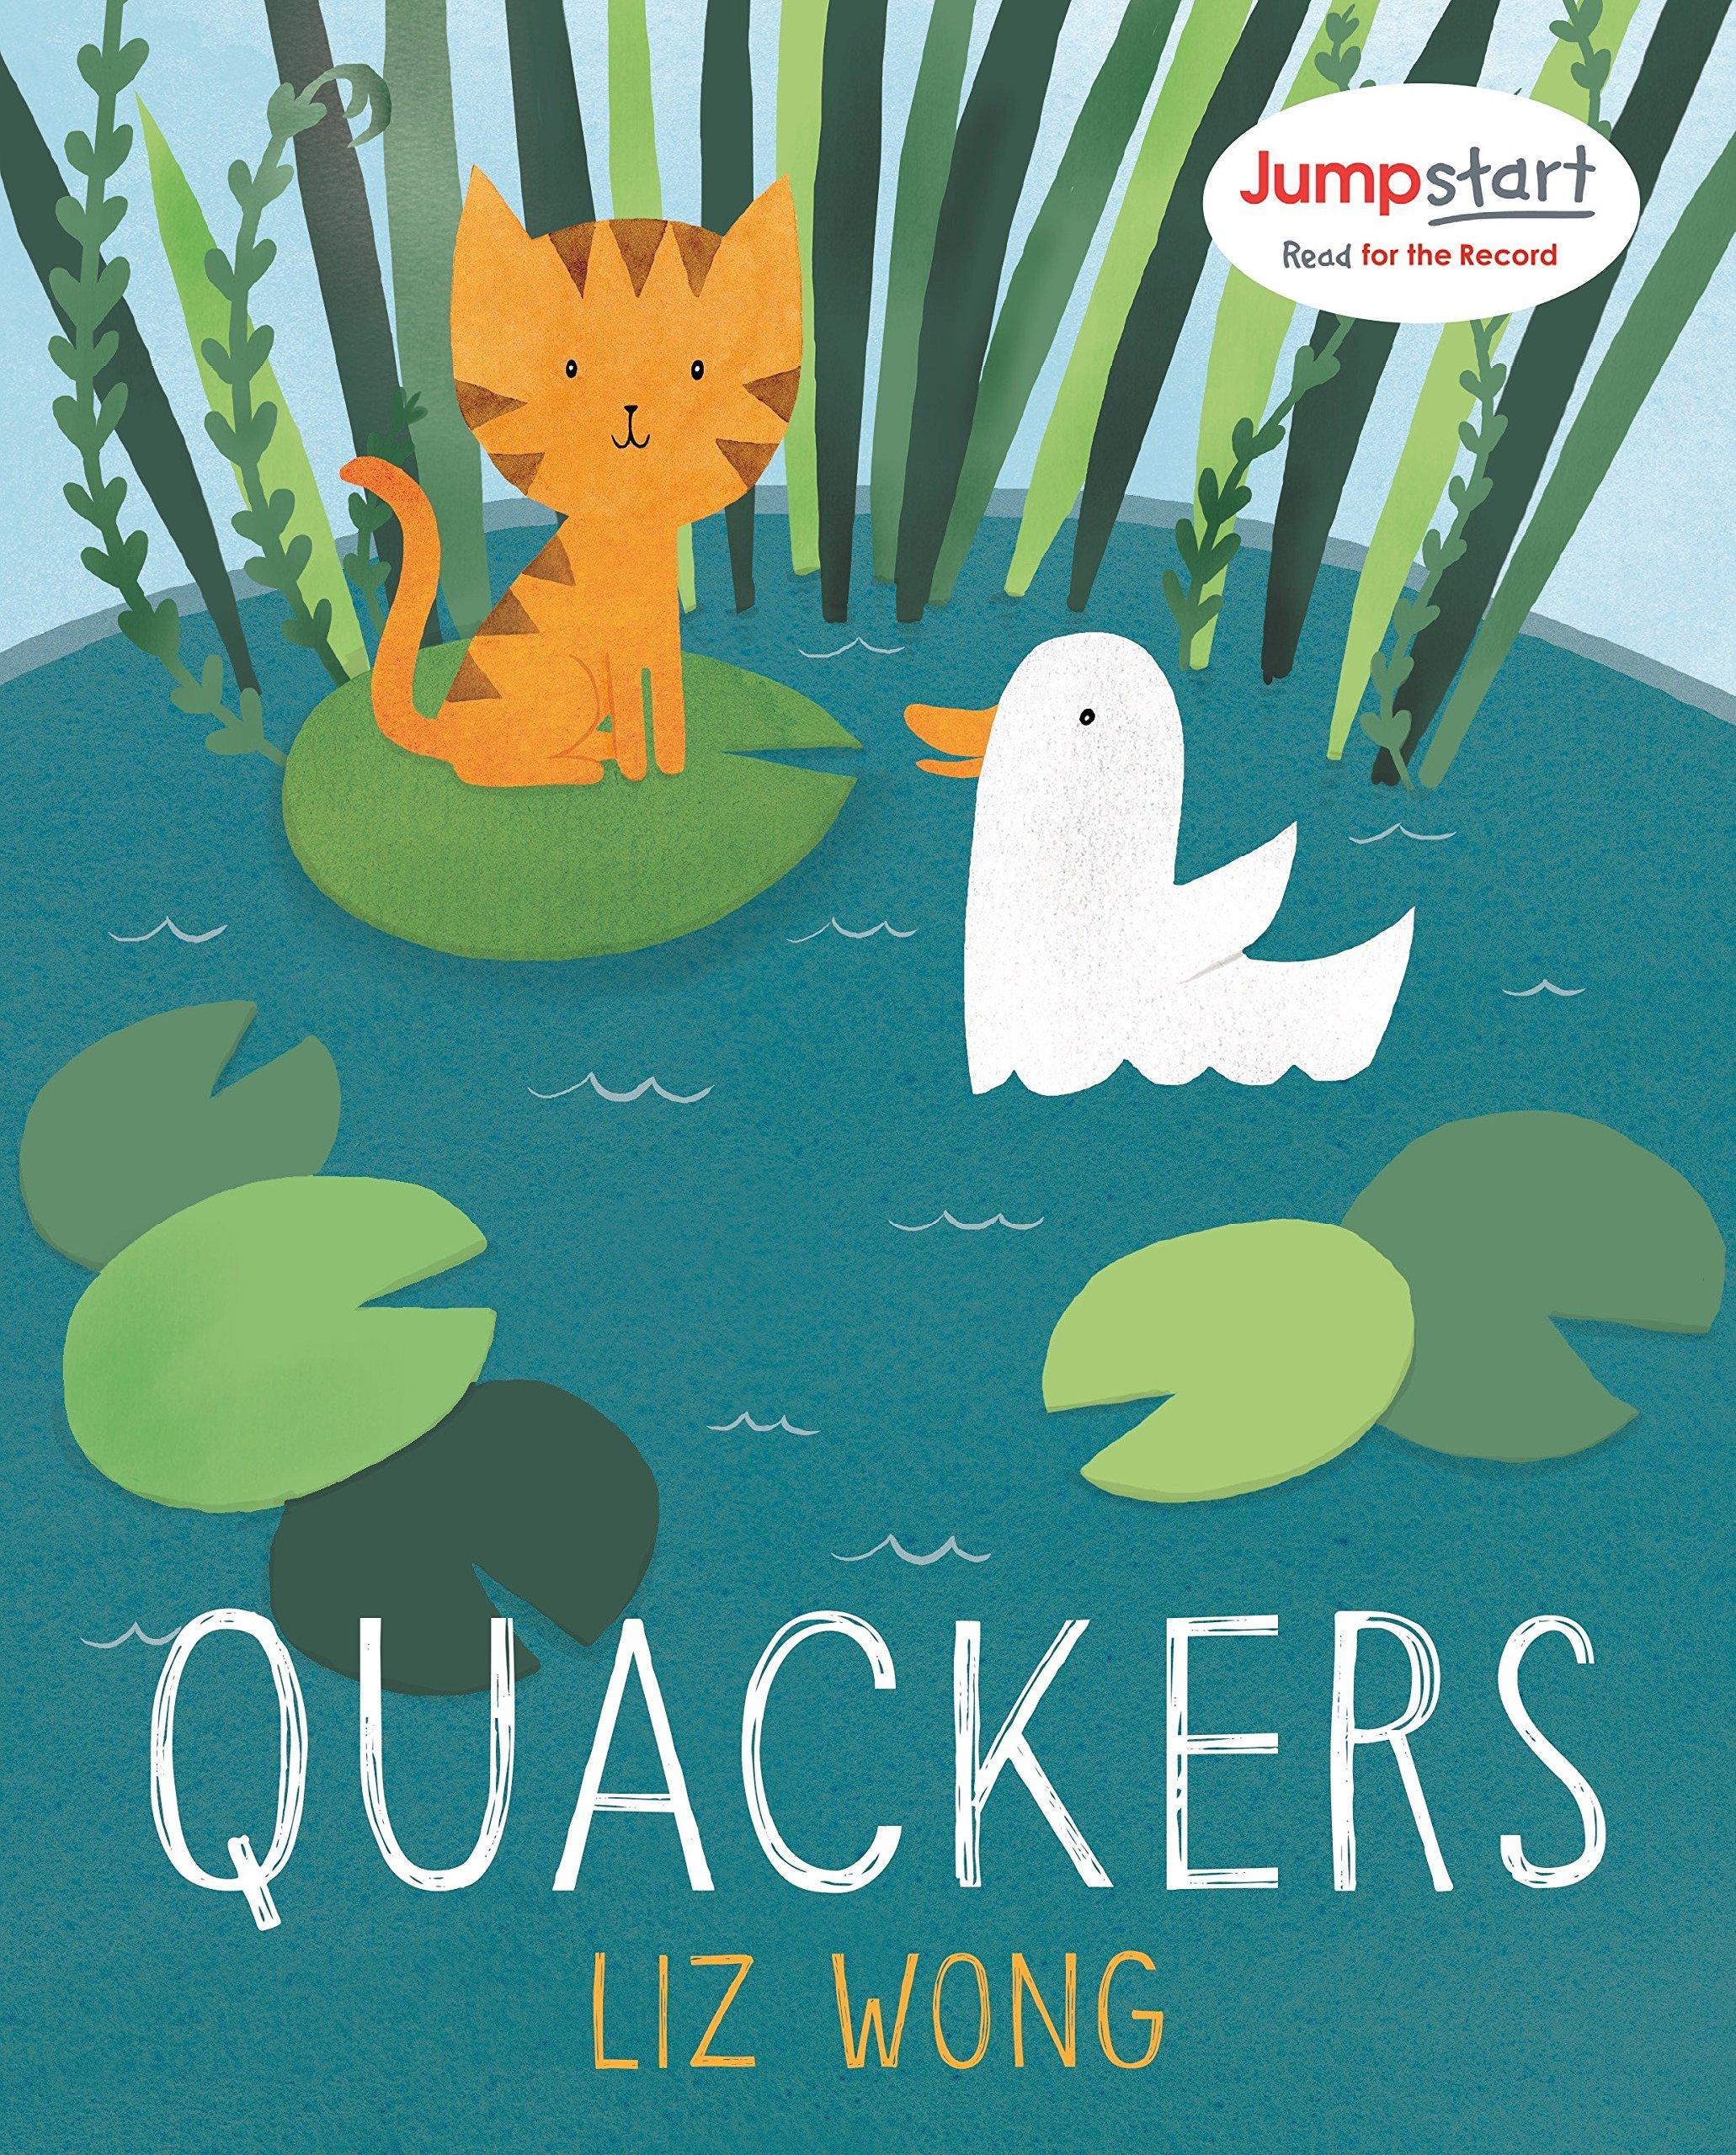 Quackers: Liz Wong: 9780553511543: Amazon.com: Books